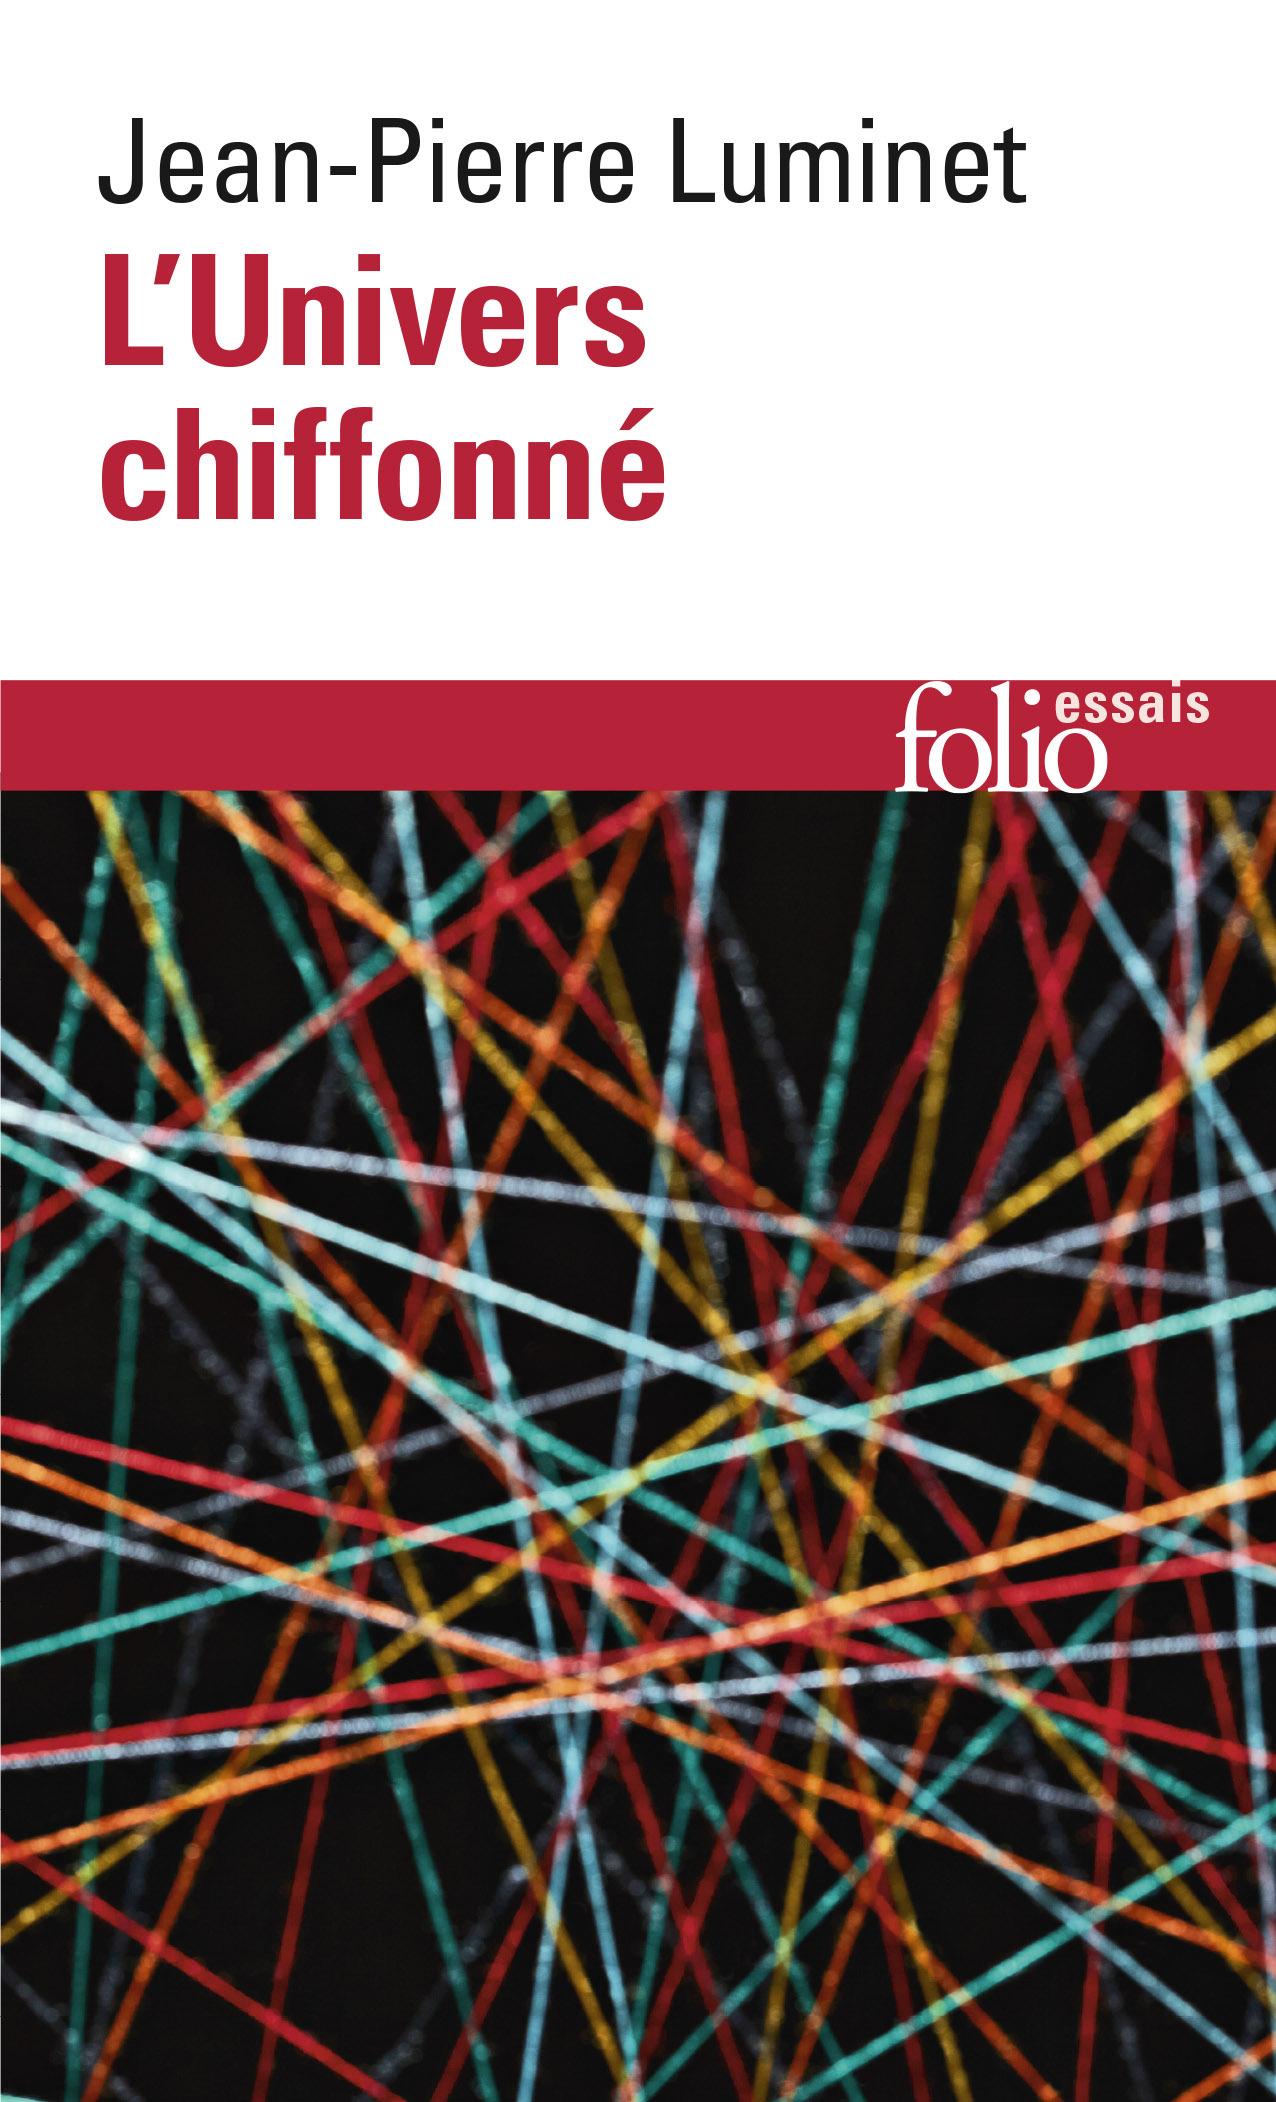 L'UNIVERS CHIFFONNE